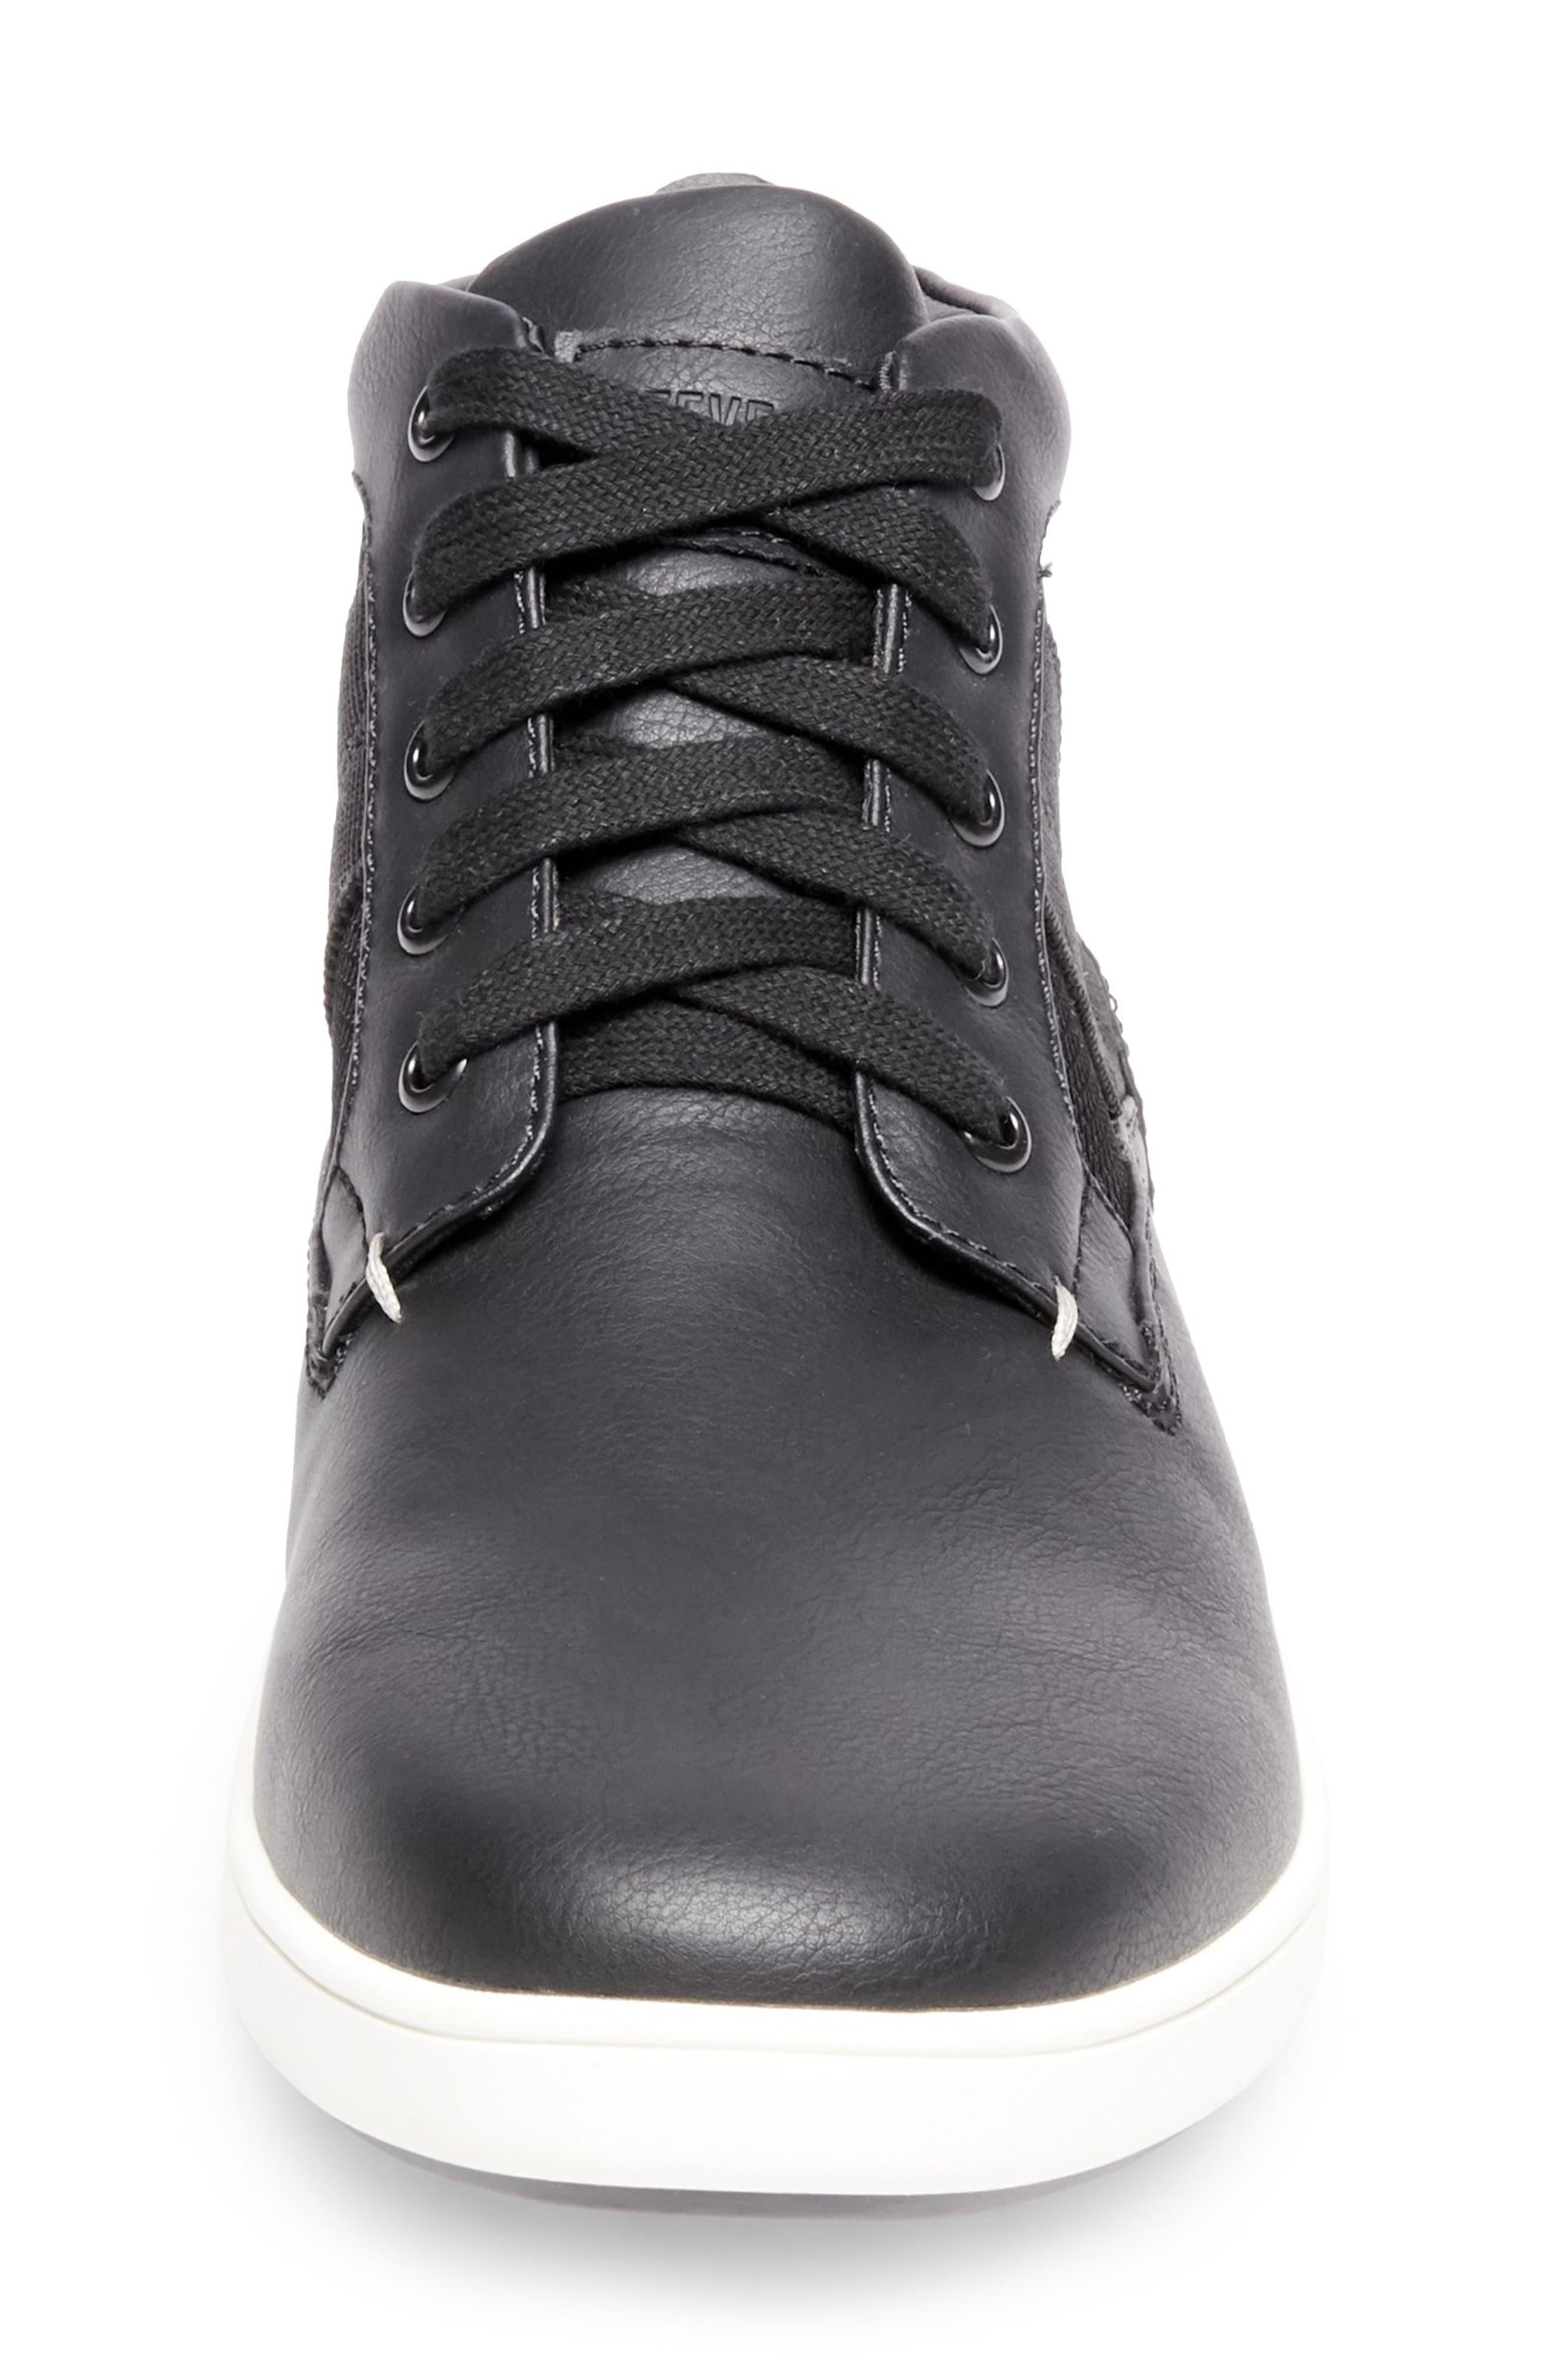 Frazier Sneaker Boot,                             Alternate thumbnail 4, color,                             007